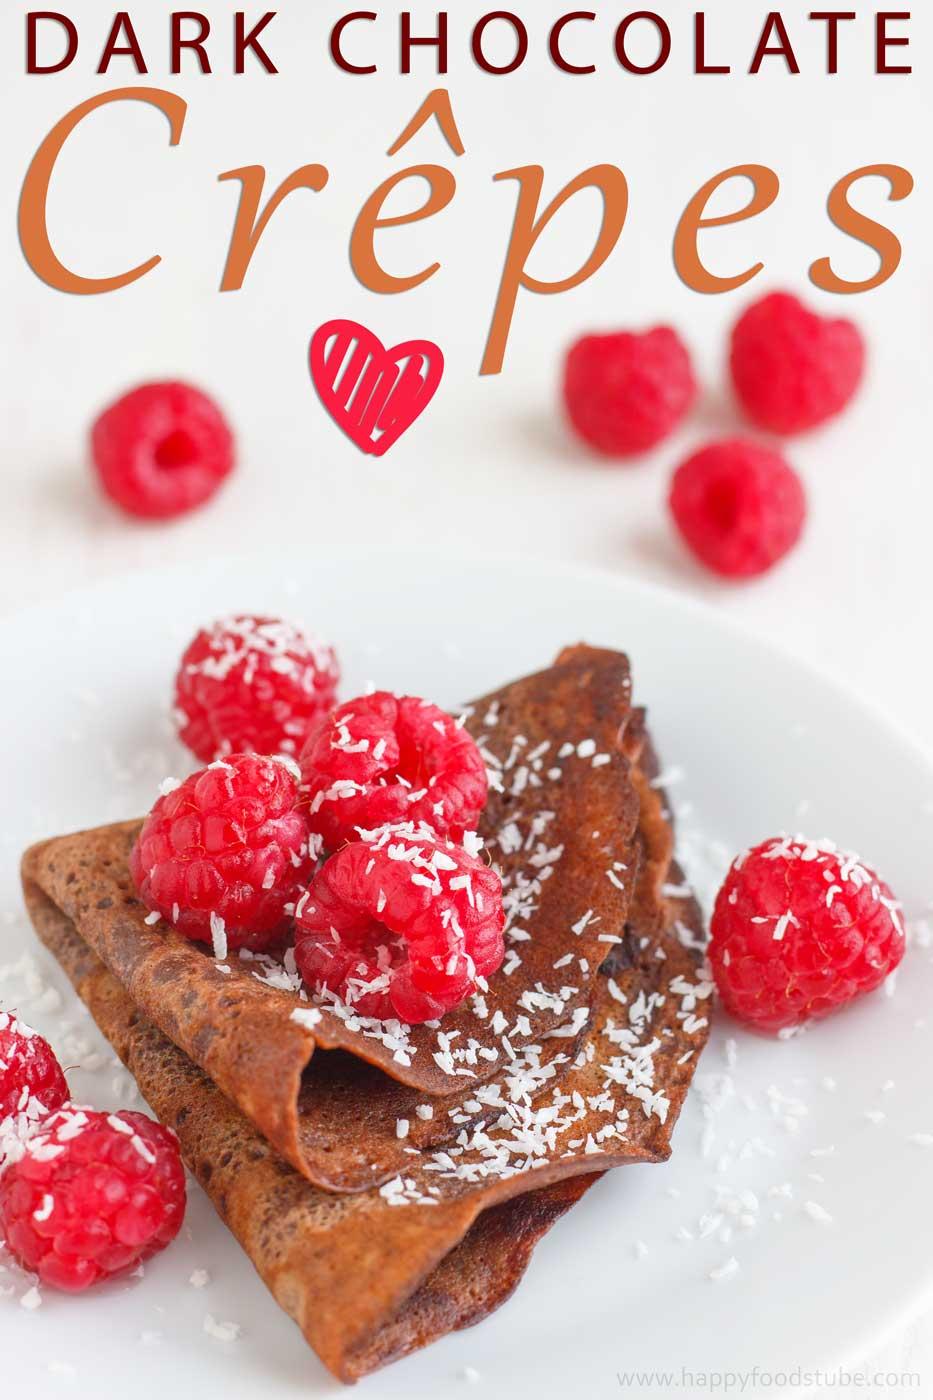 Dark Chocolate Crepes with Raspberries